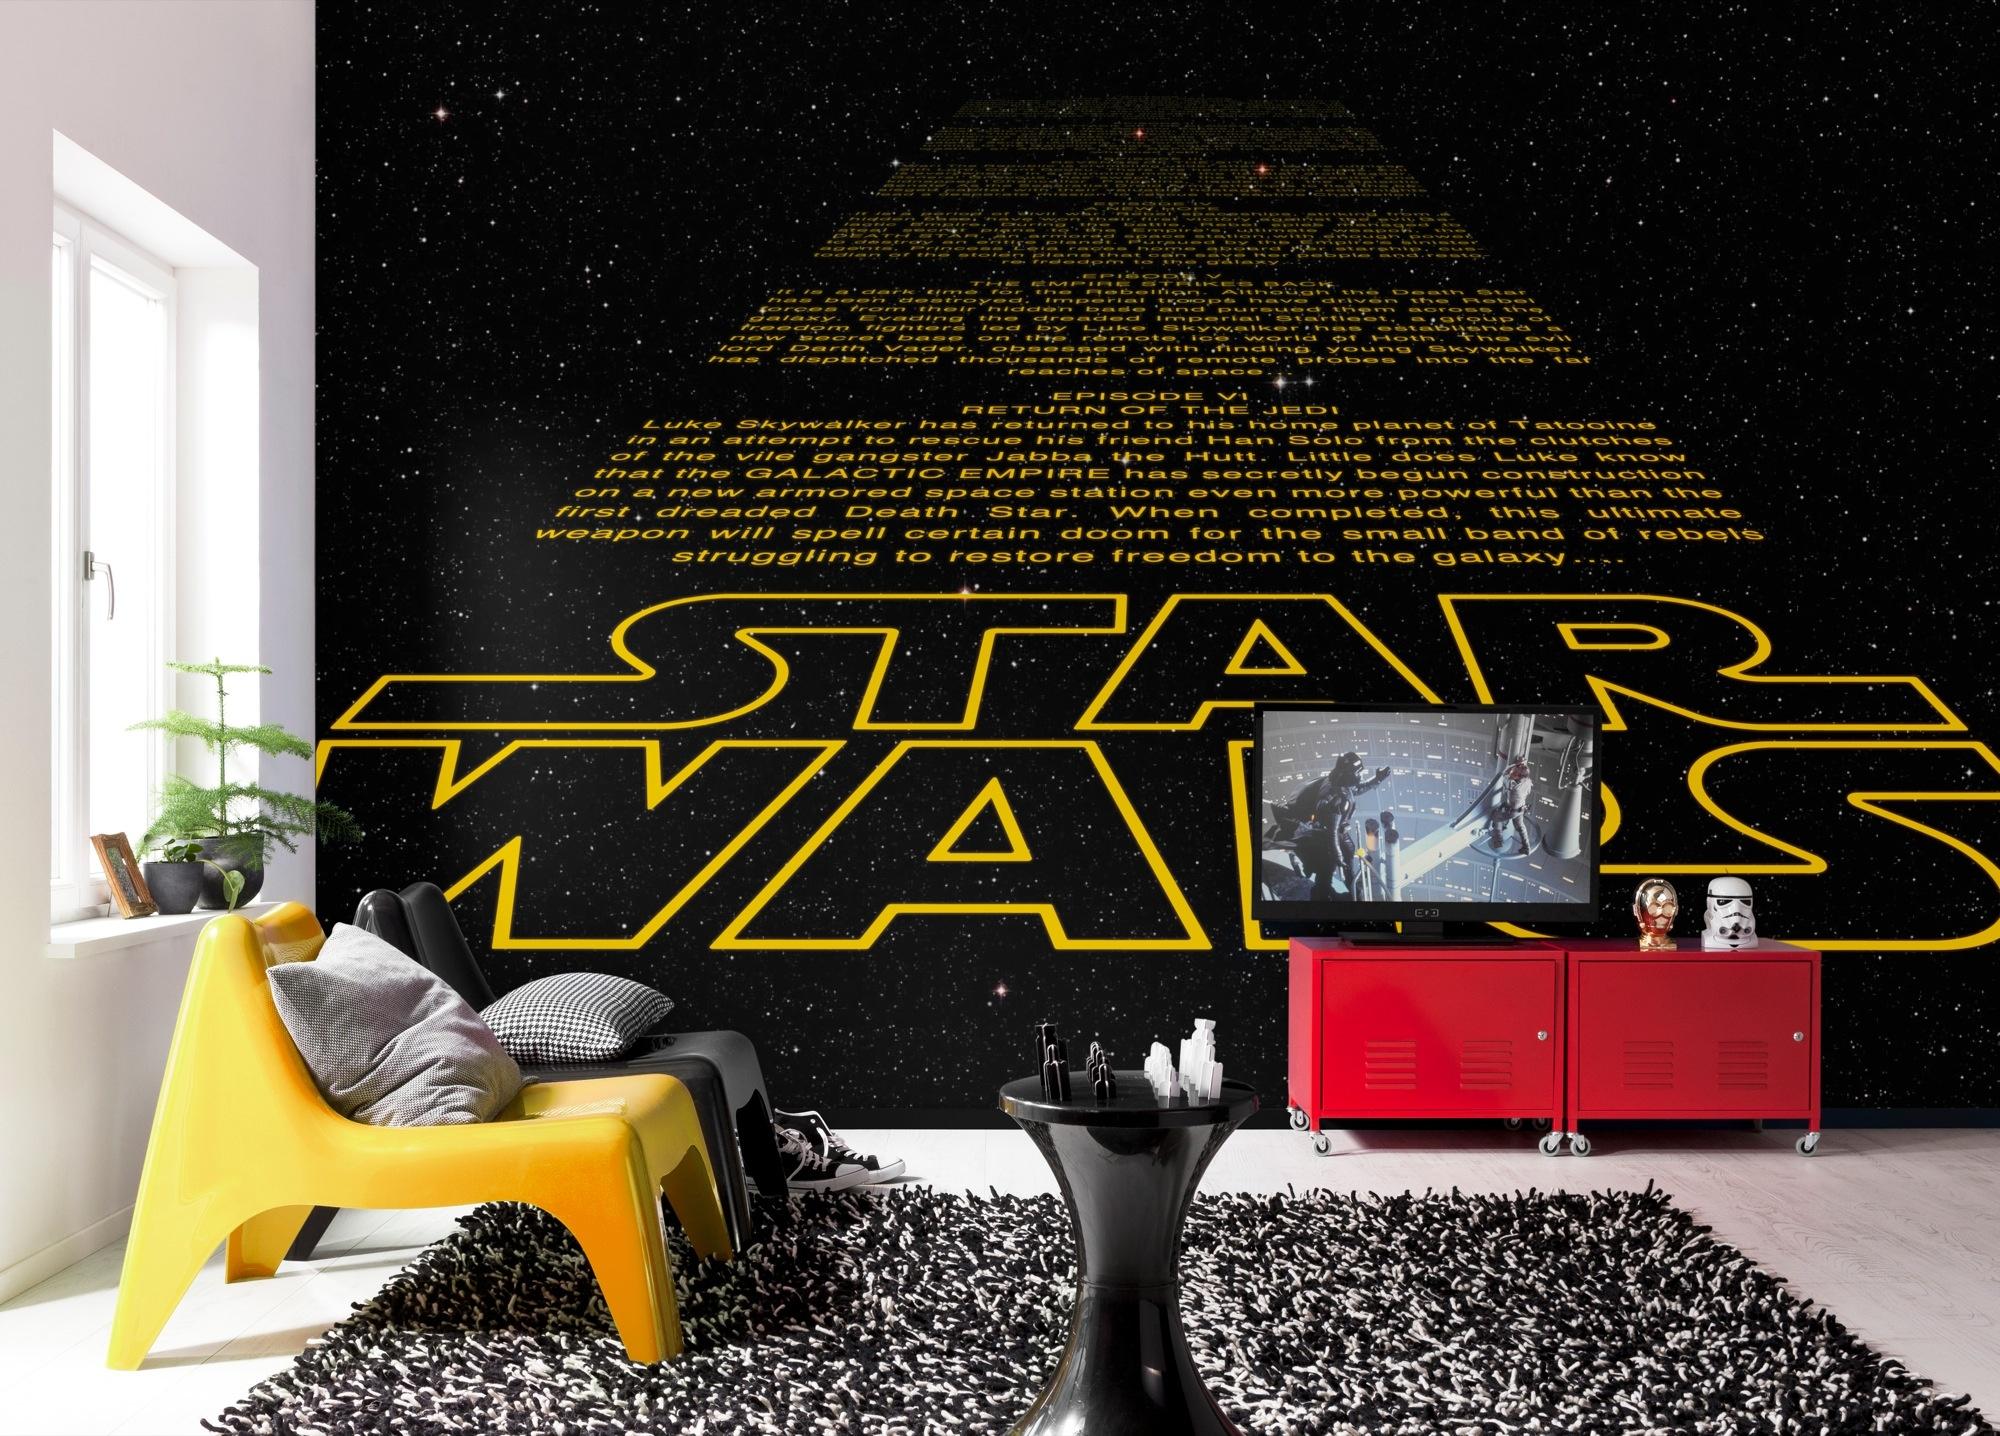 Disney Edition 4 Kinderbehang Komar - Kinderkamer behang  STAR WARS INTRO